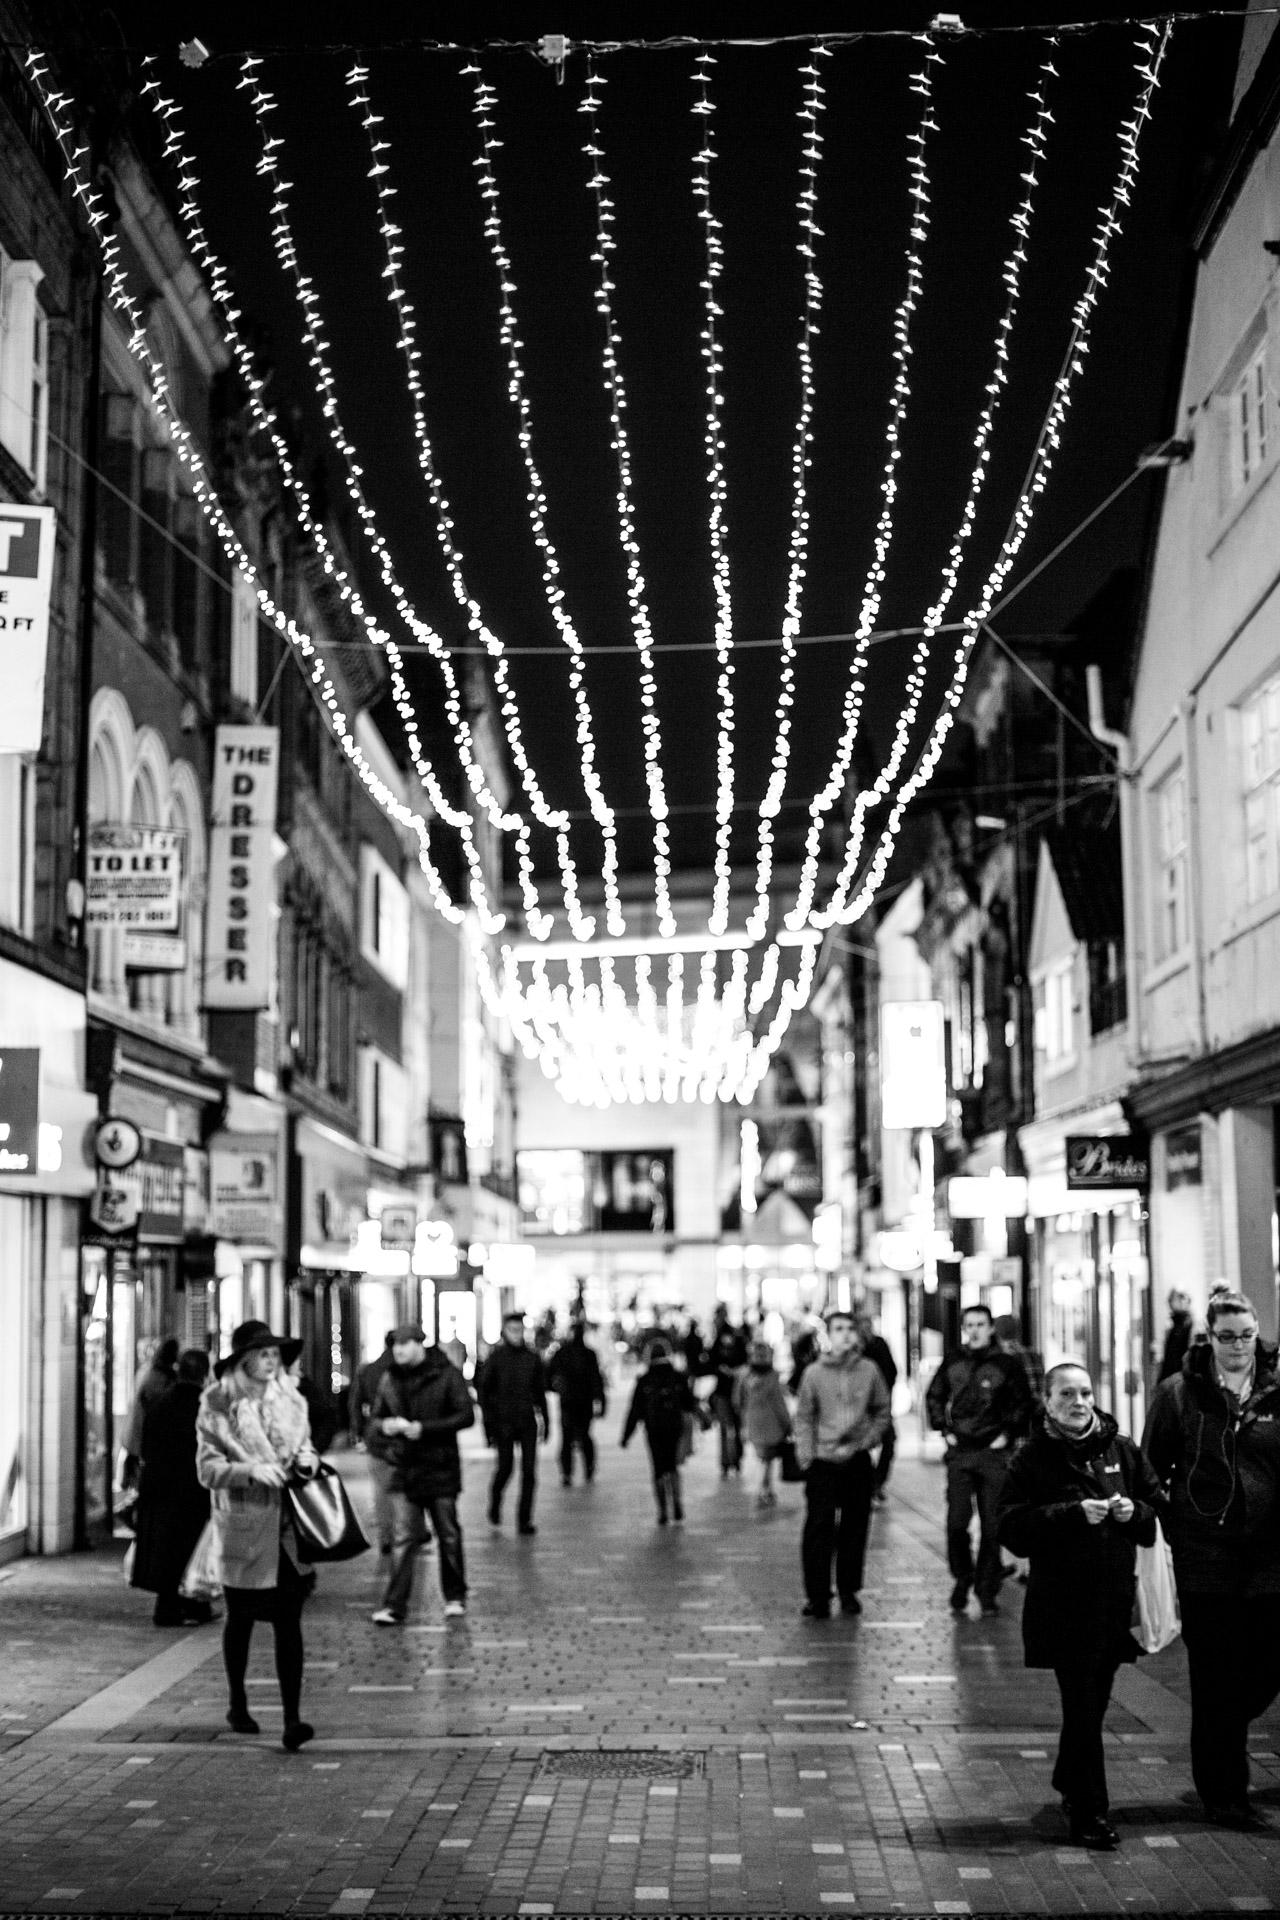 Liverpool 2013 (16) Clayton Square Christmas Lights.jpg